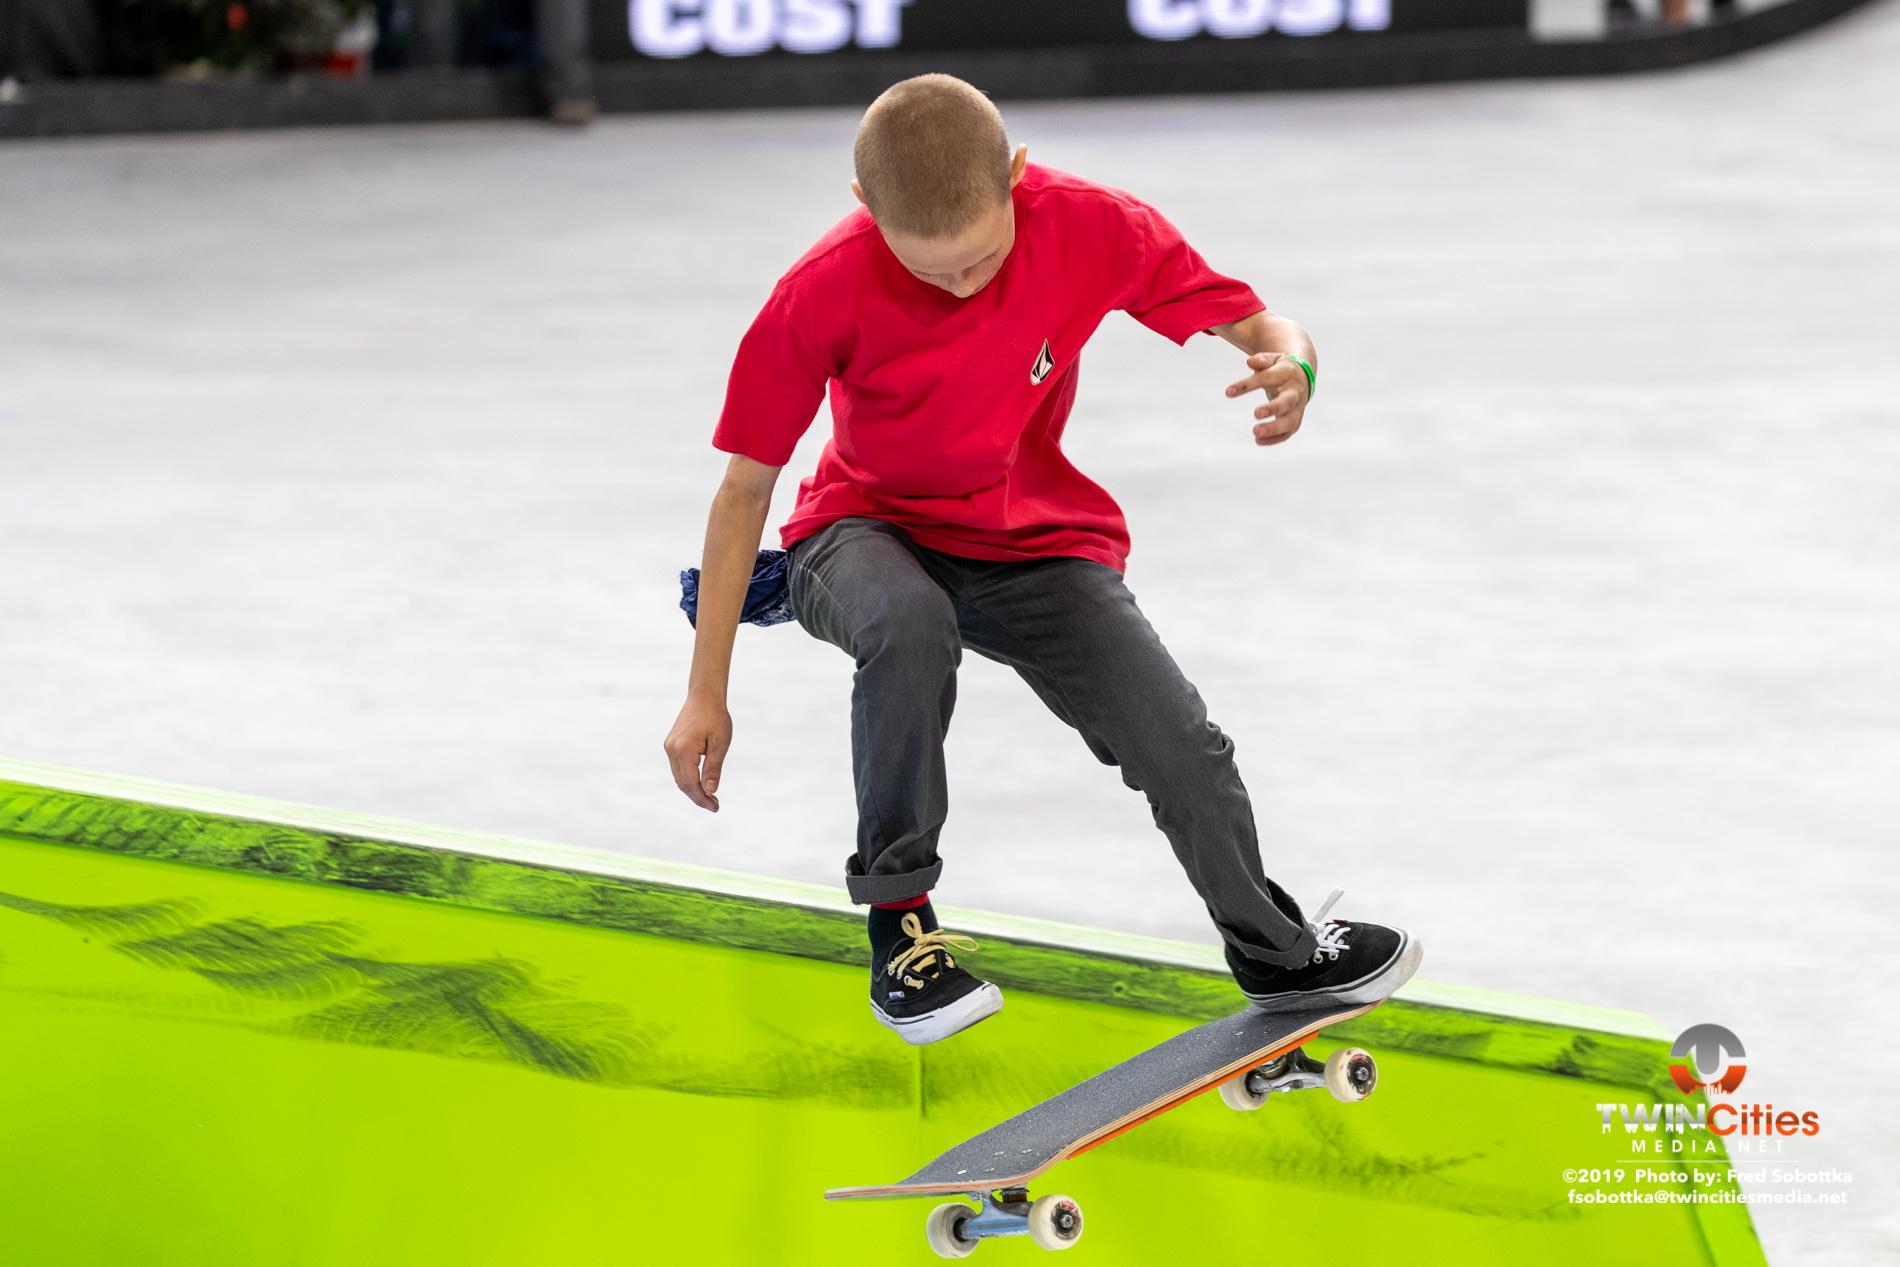 Next-X-Skateboard-Street-03